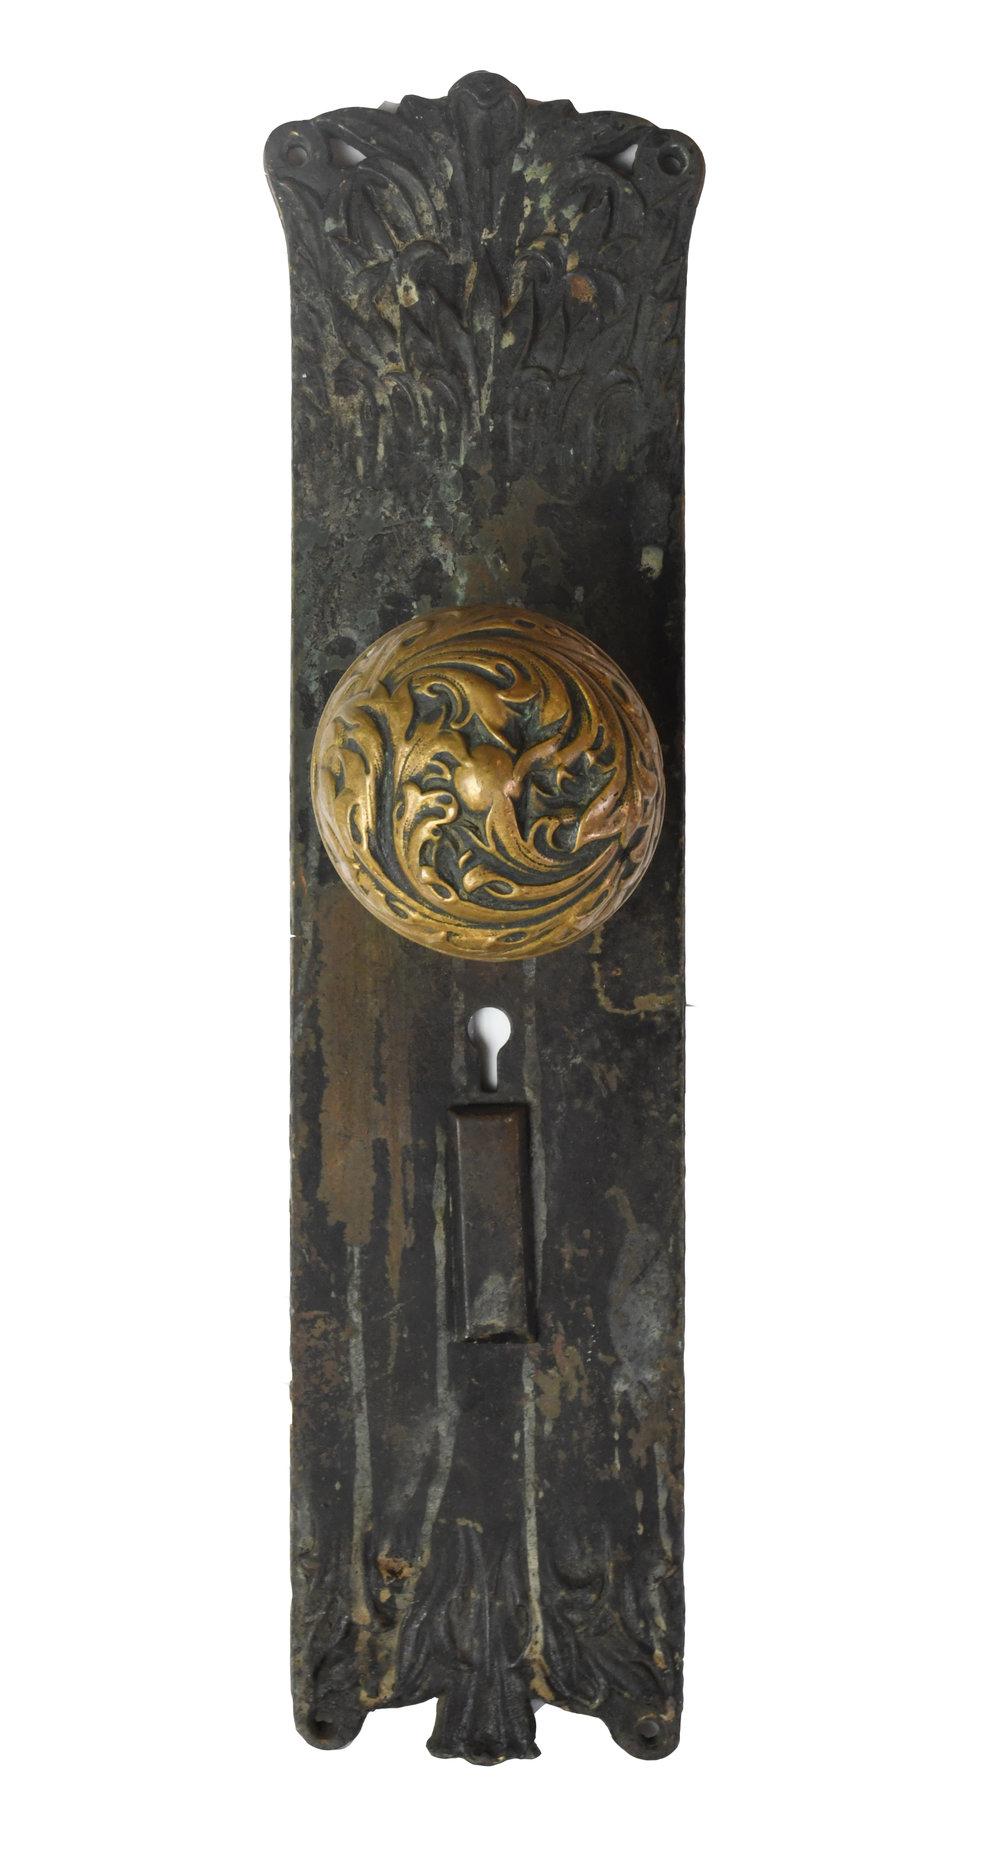 H20169-cast-brass-corbin-florence-door-knob-set-both-6.jpg